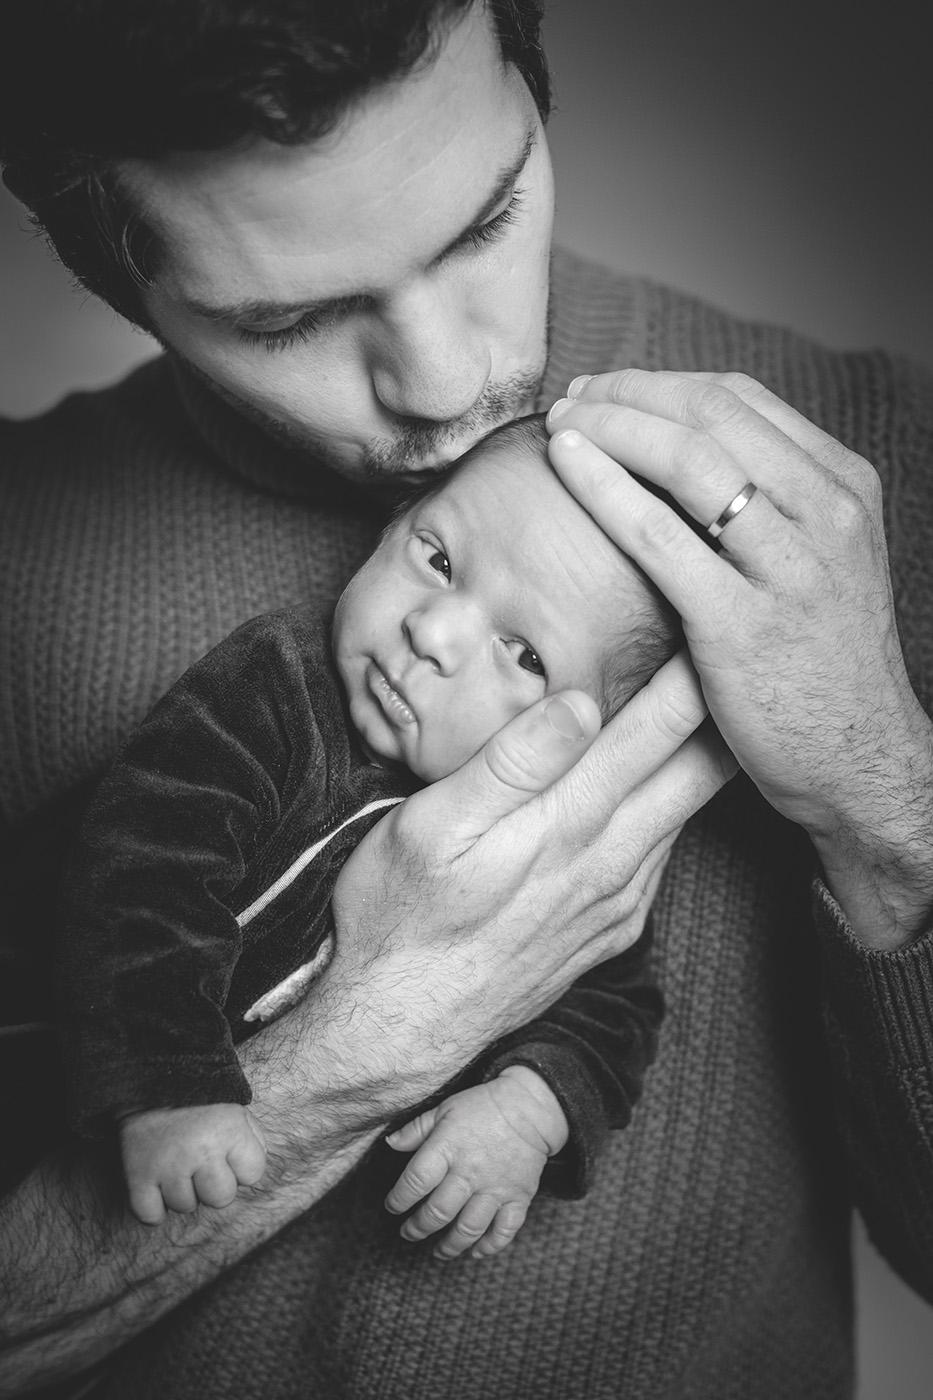 photographe-naissance-maternite-enfant-bebe-poitiers-guillaume-heraud-15